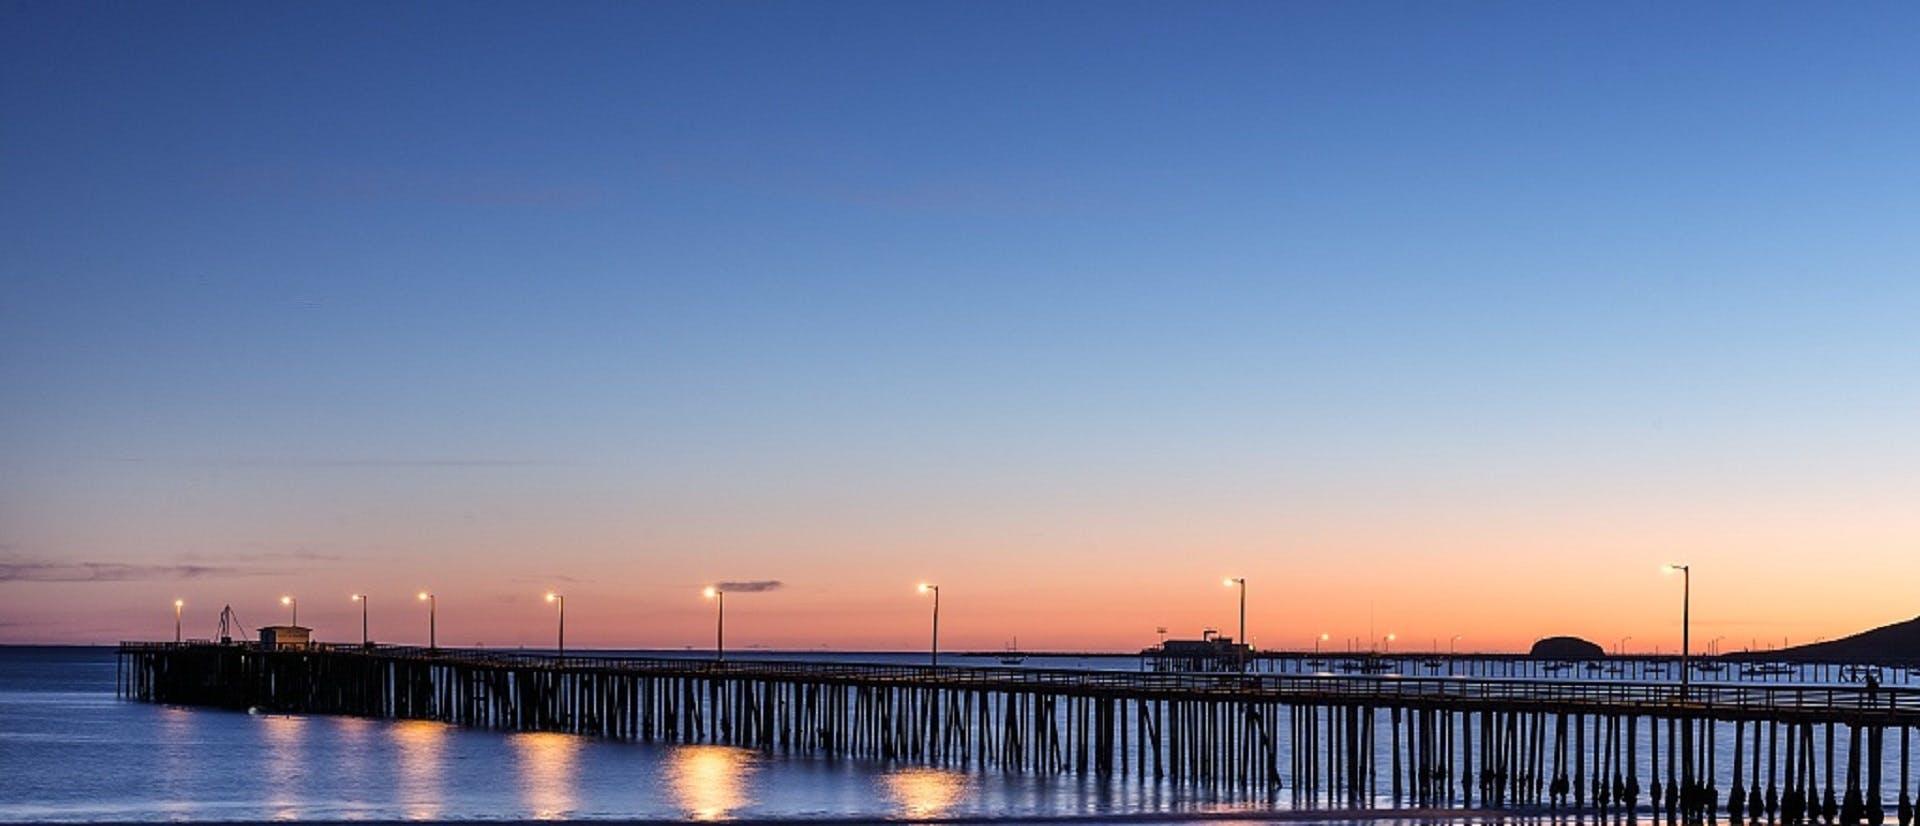 dawn, dusk, ocean